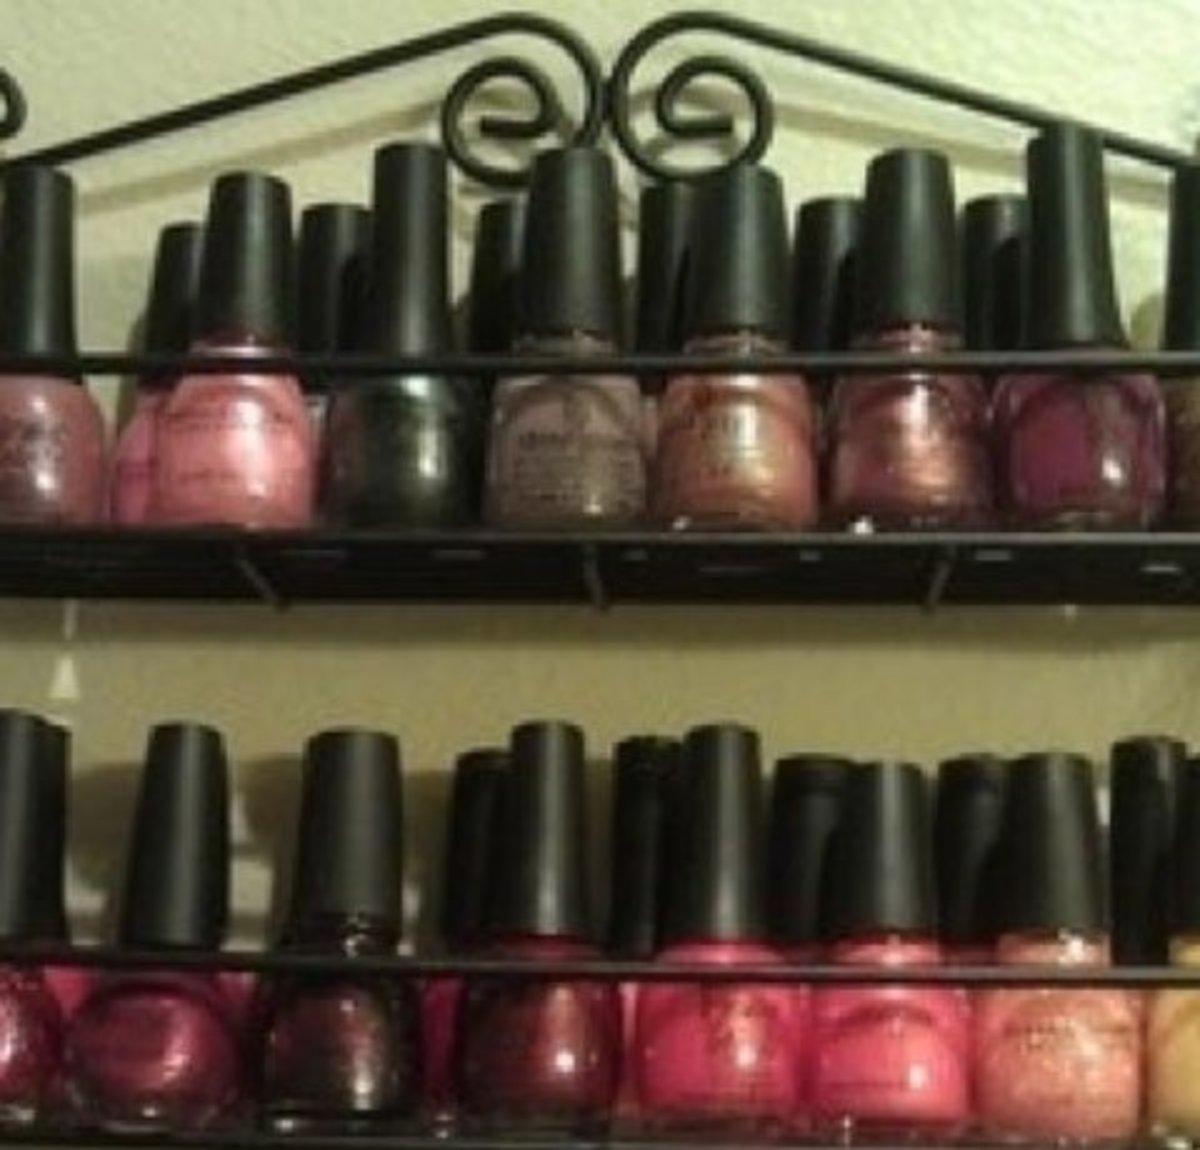 Spice Rack for Nail Varnish | DIY Makeup Organization Ideas